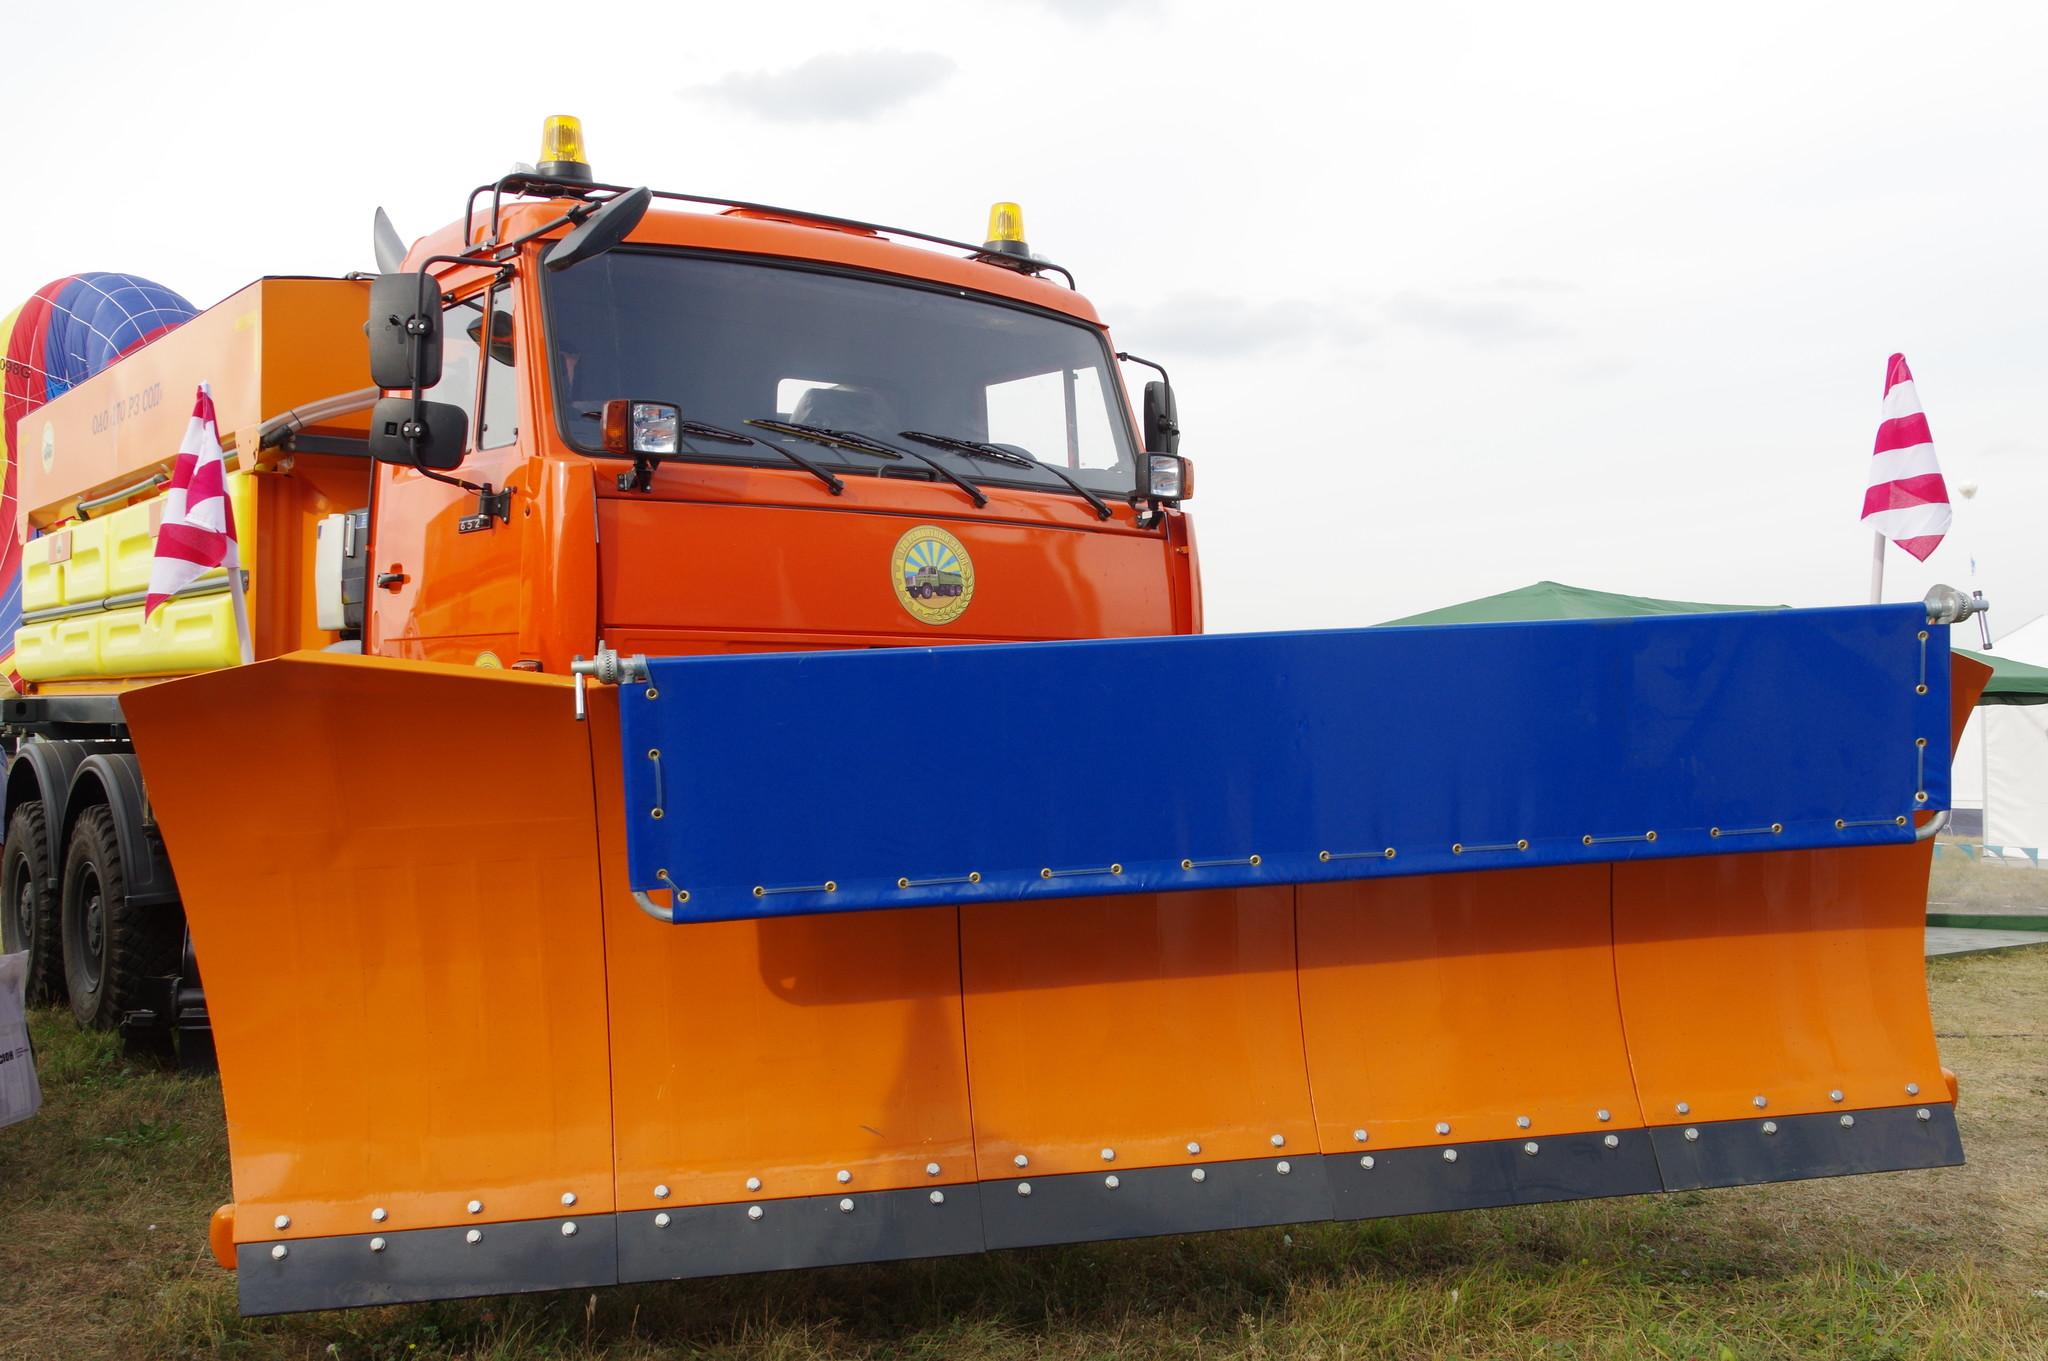 Аэродромная комбинированная уборочная машина АКУМ-9 РЗ. Шасси КАМАЗ-6522 6х6 (полноприводное)